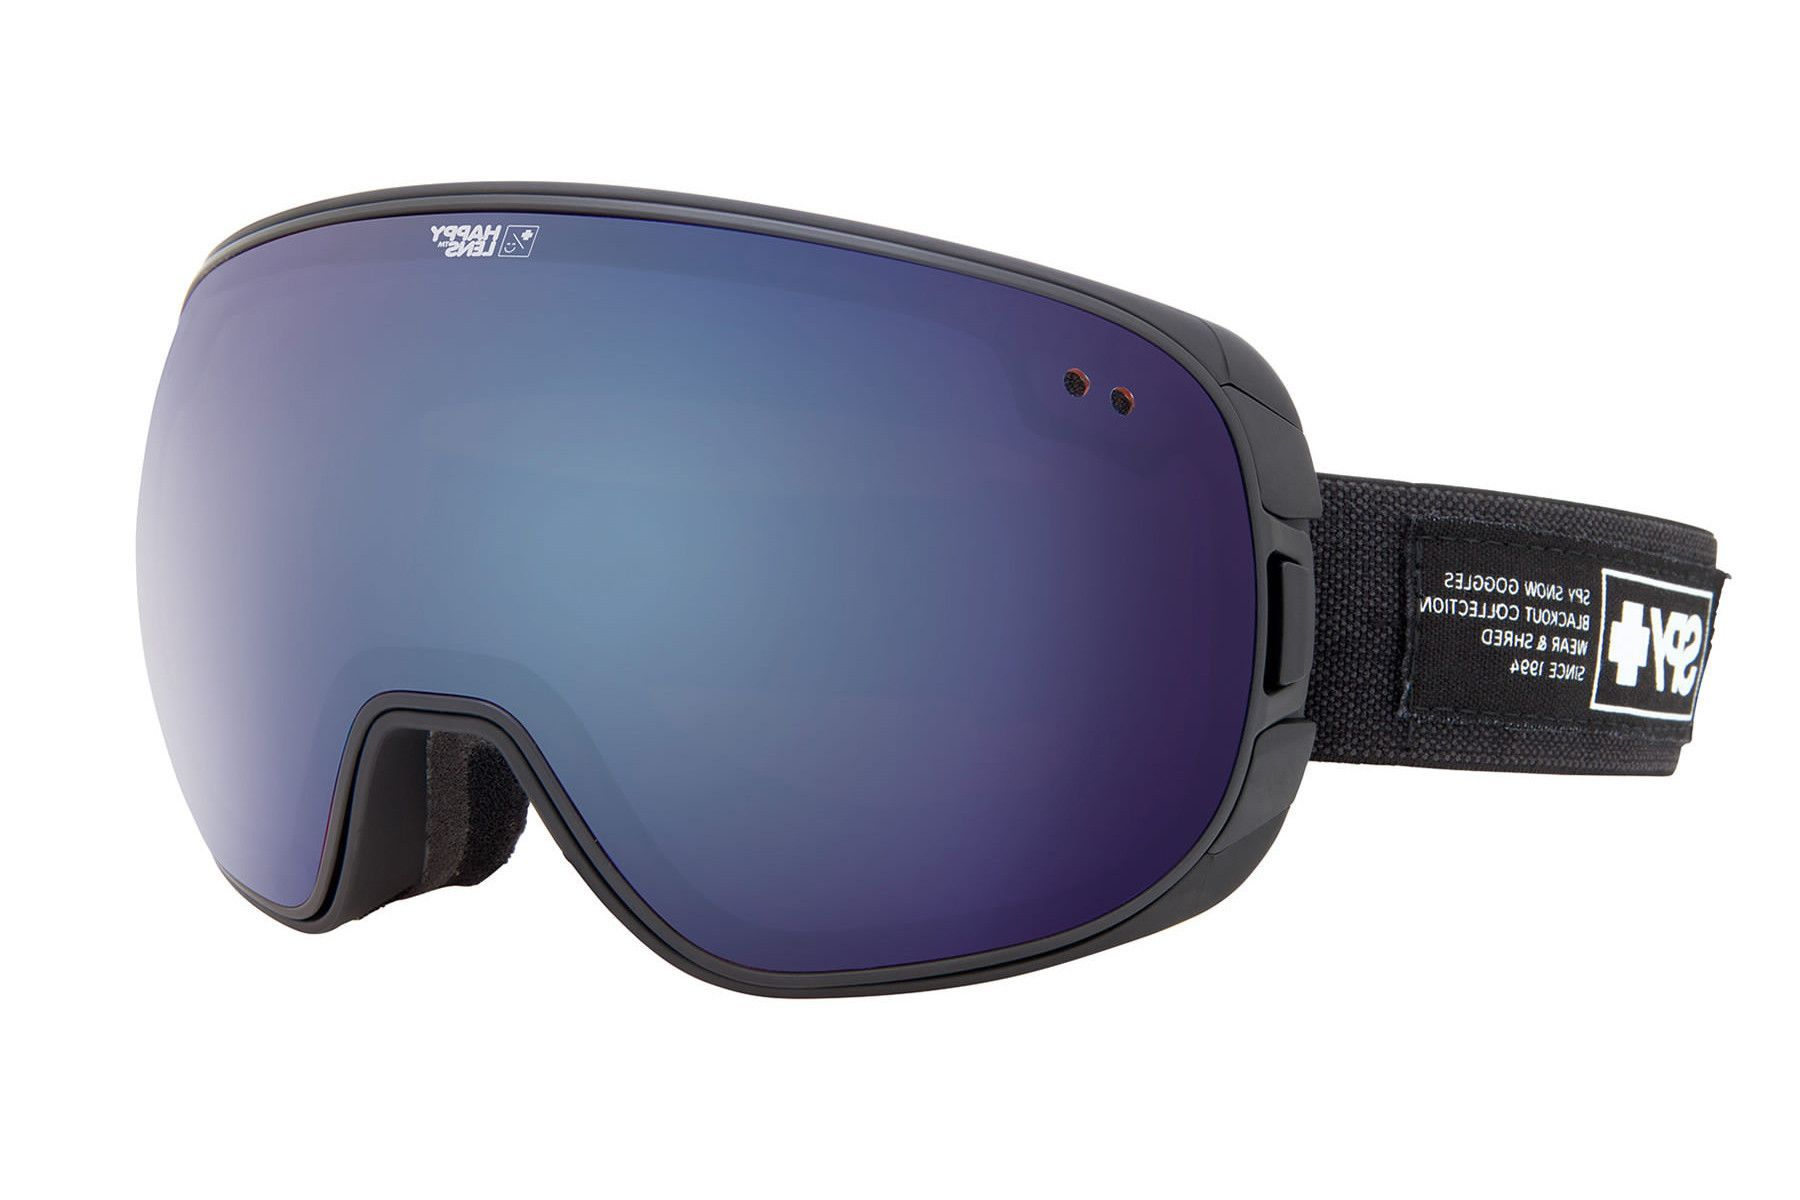 Spy - Bravo Nocturnal Goggles, Happy Bronze W/ Dark Blue Spectra (+Happy Rose W/ Green Spectra) Lenses